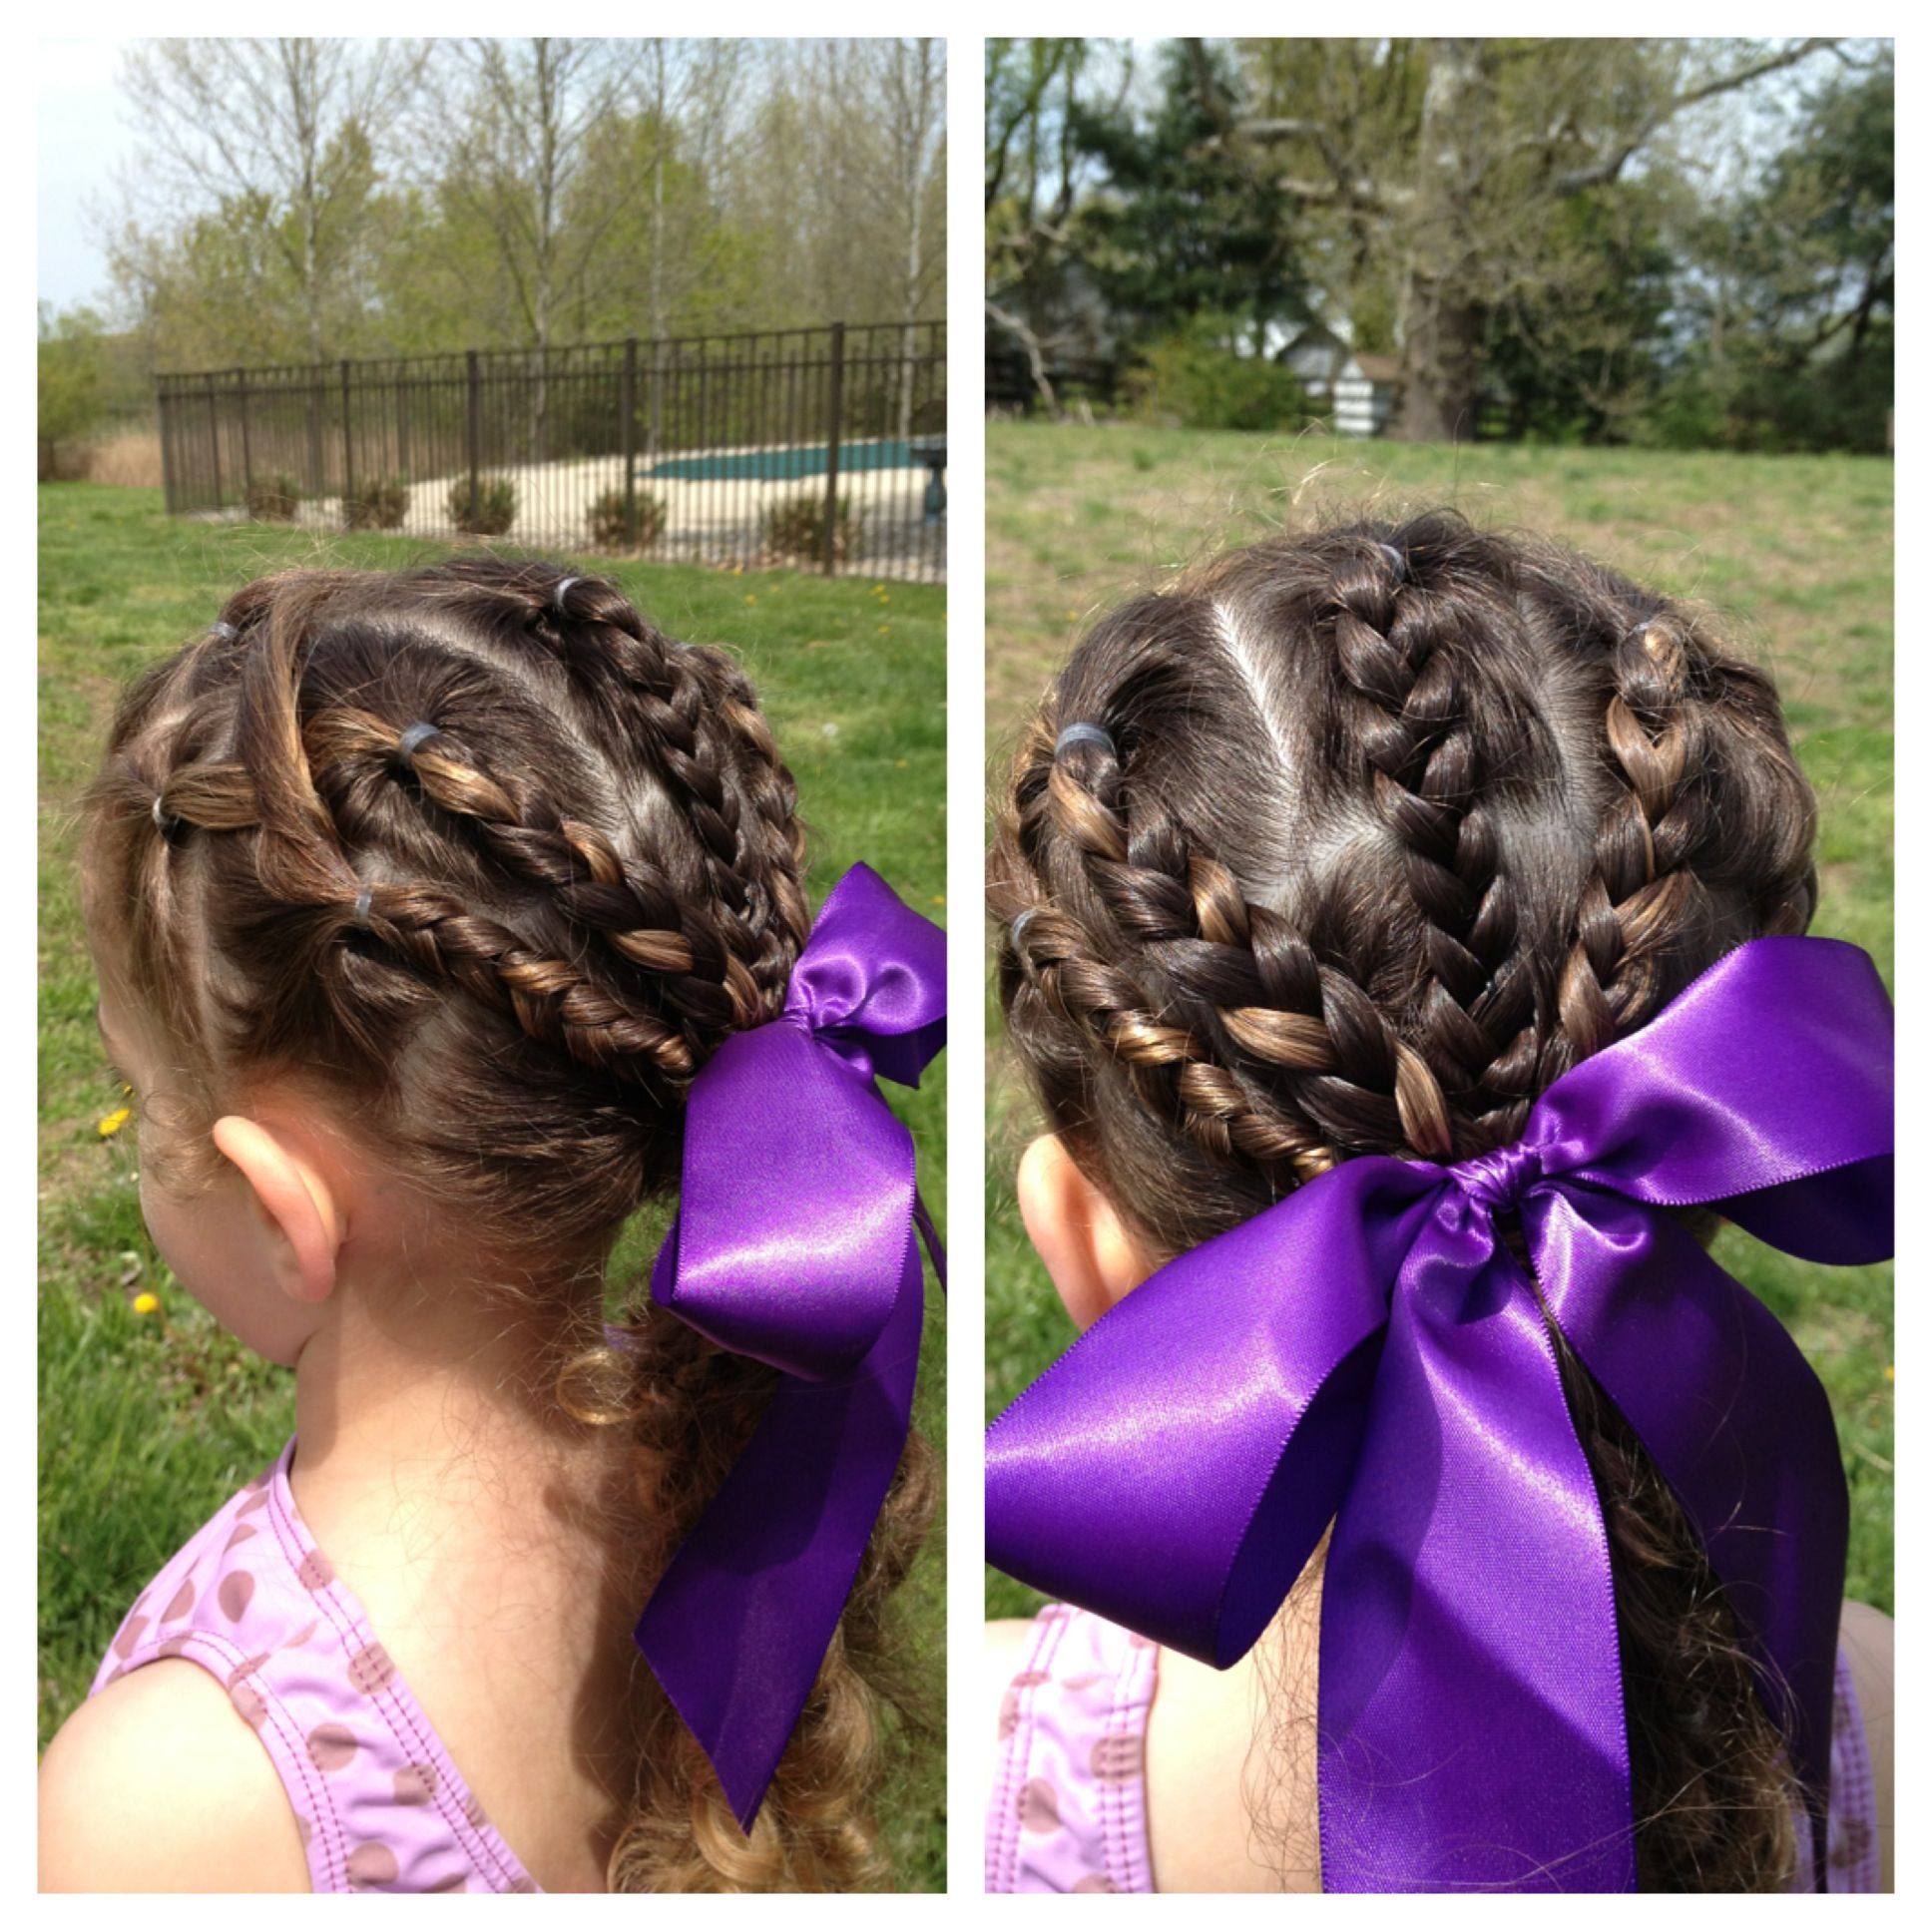 Gymnastics Hair Soccer HairstylesGymnastics HairstylesGirl